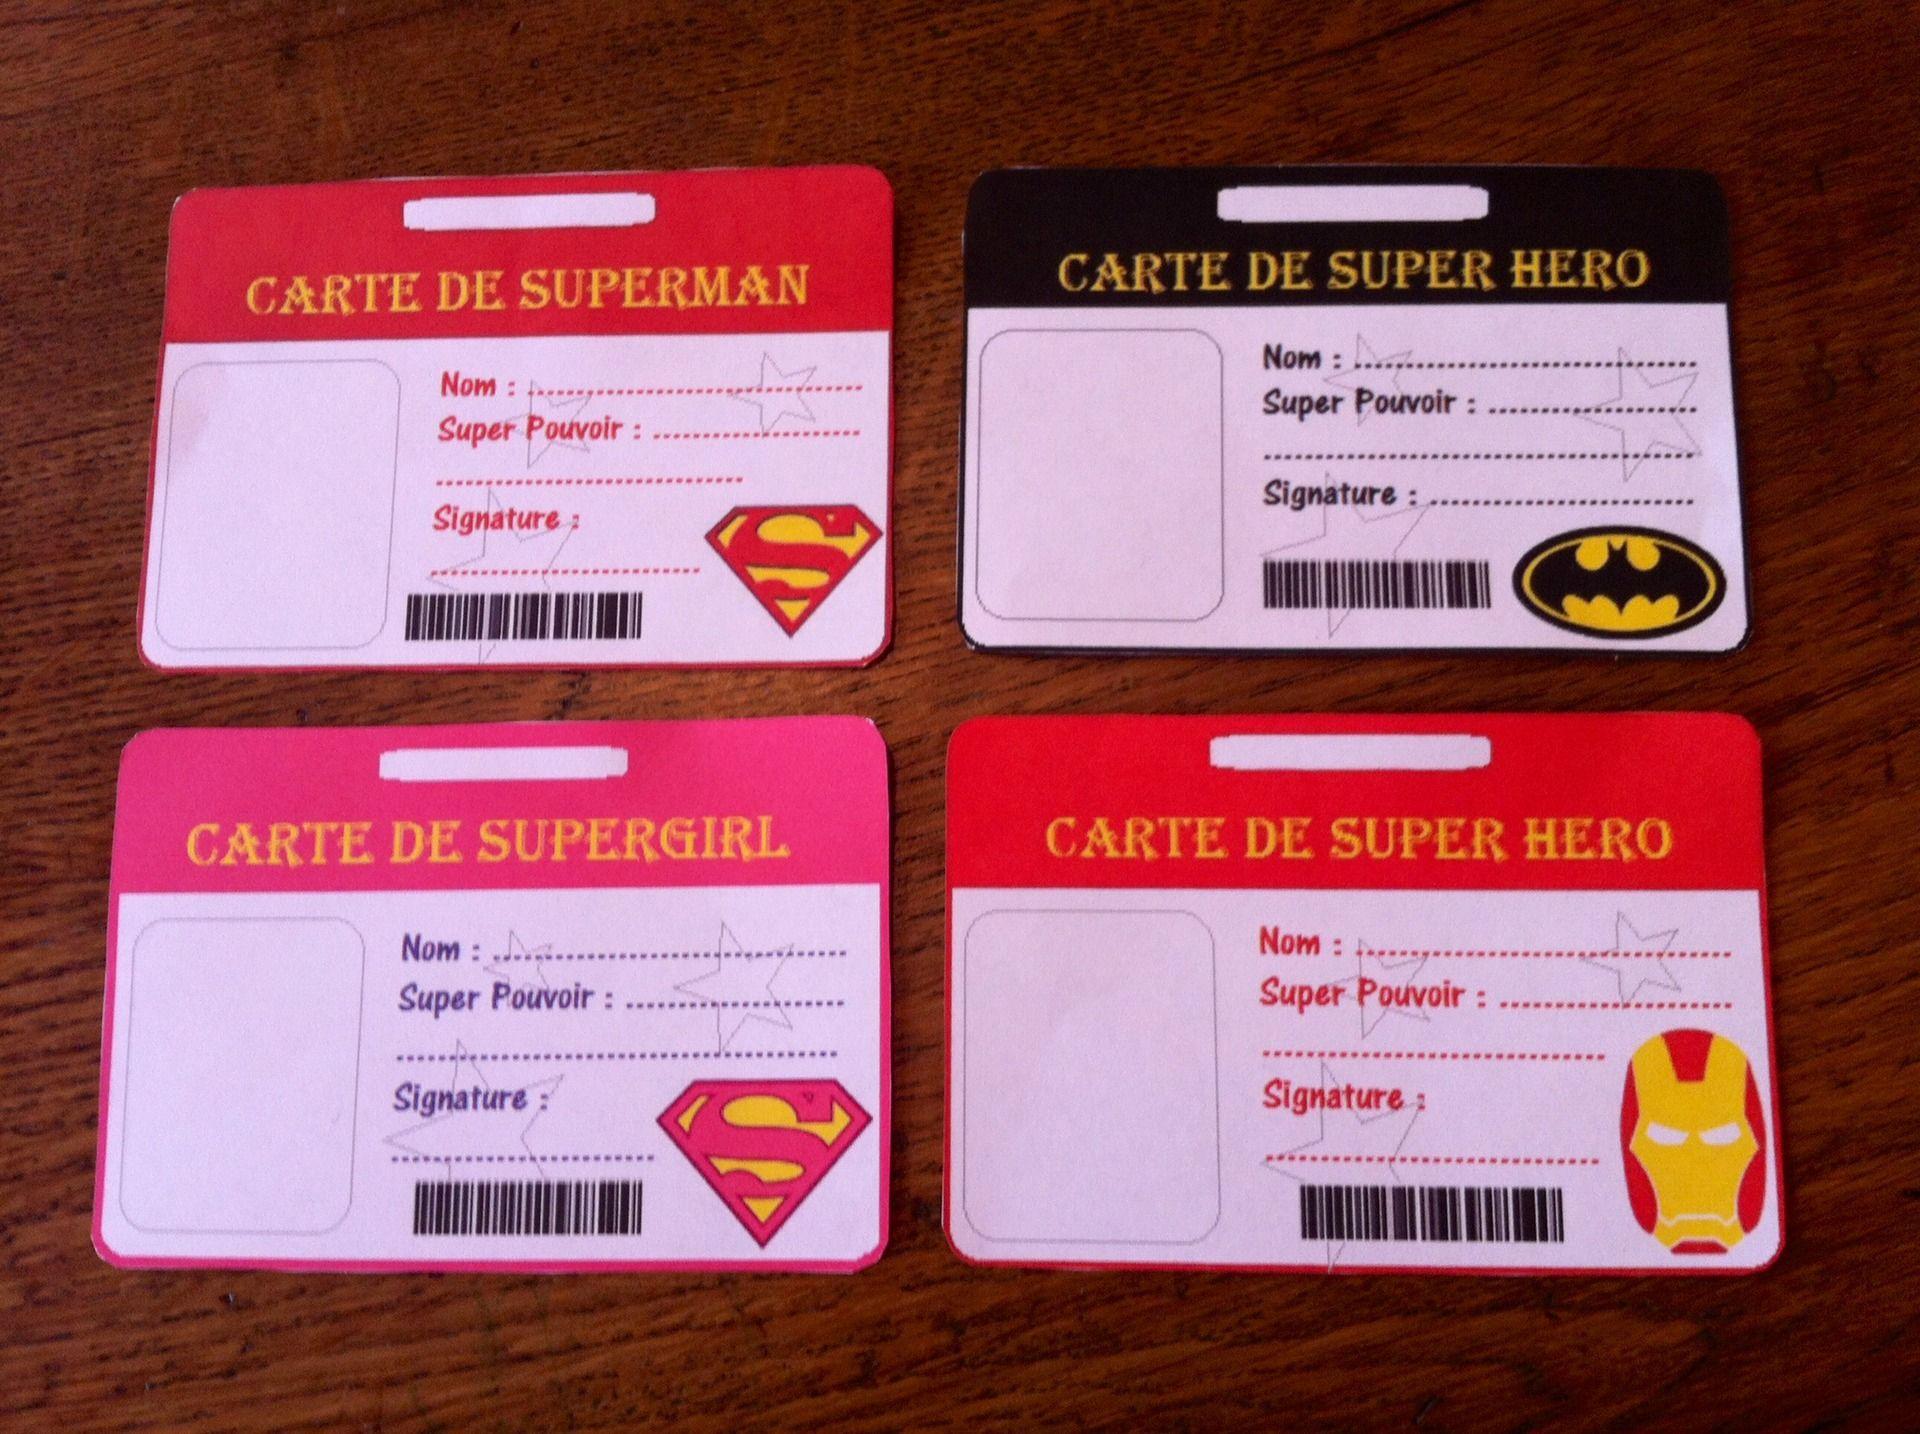 Pingl par audrey trufin sur bricolage superhero birthday party hero et superhero party - Super heros fille marvel ...